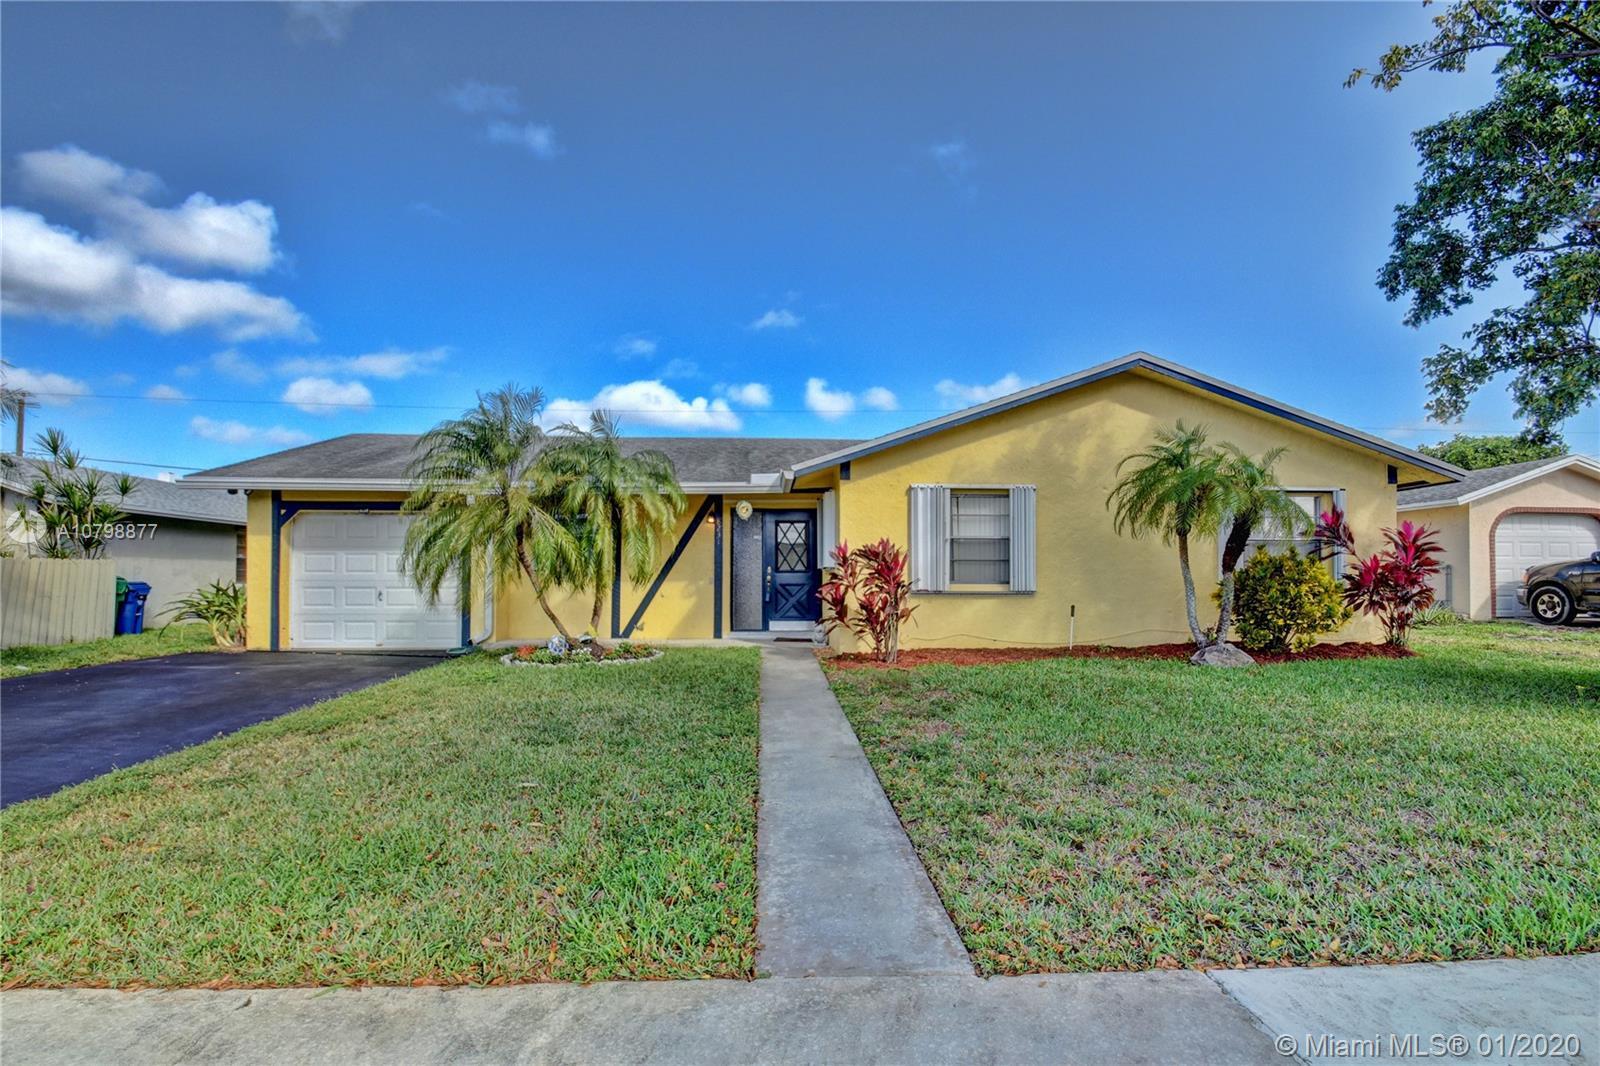 8231 NW 45th Ct, Lauderhill, FL 33351 - Lauderhill, FL real estate listing